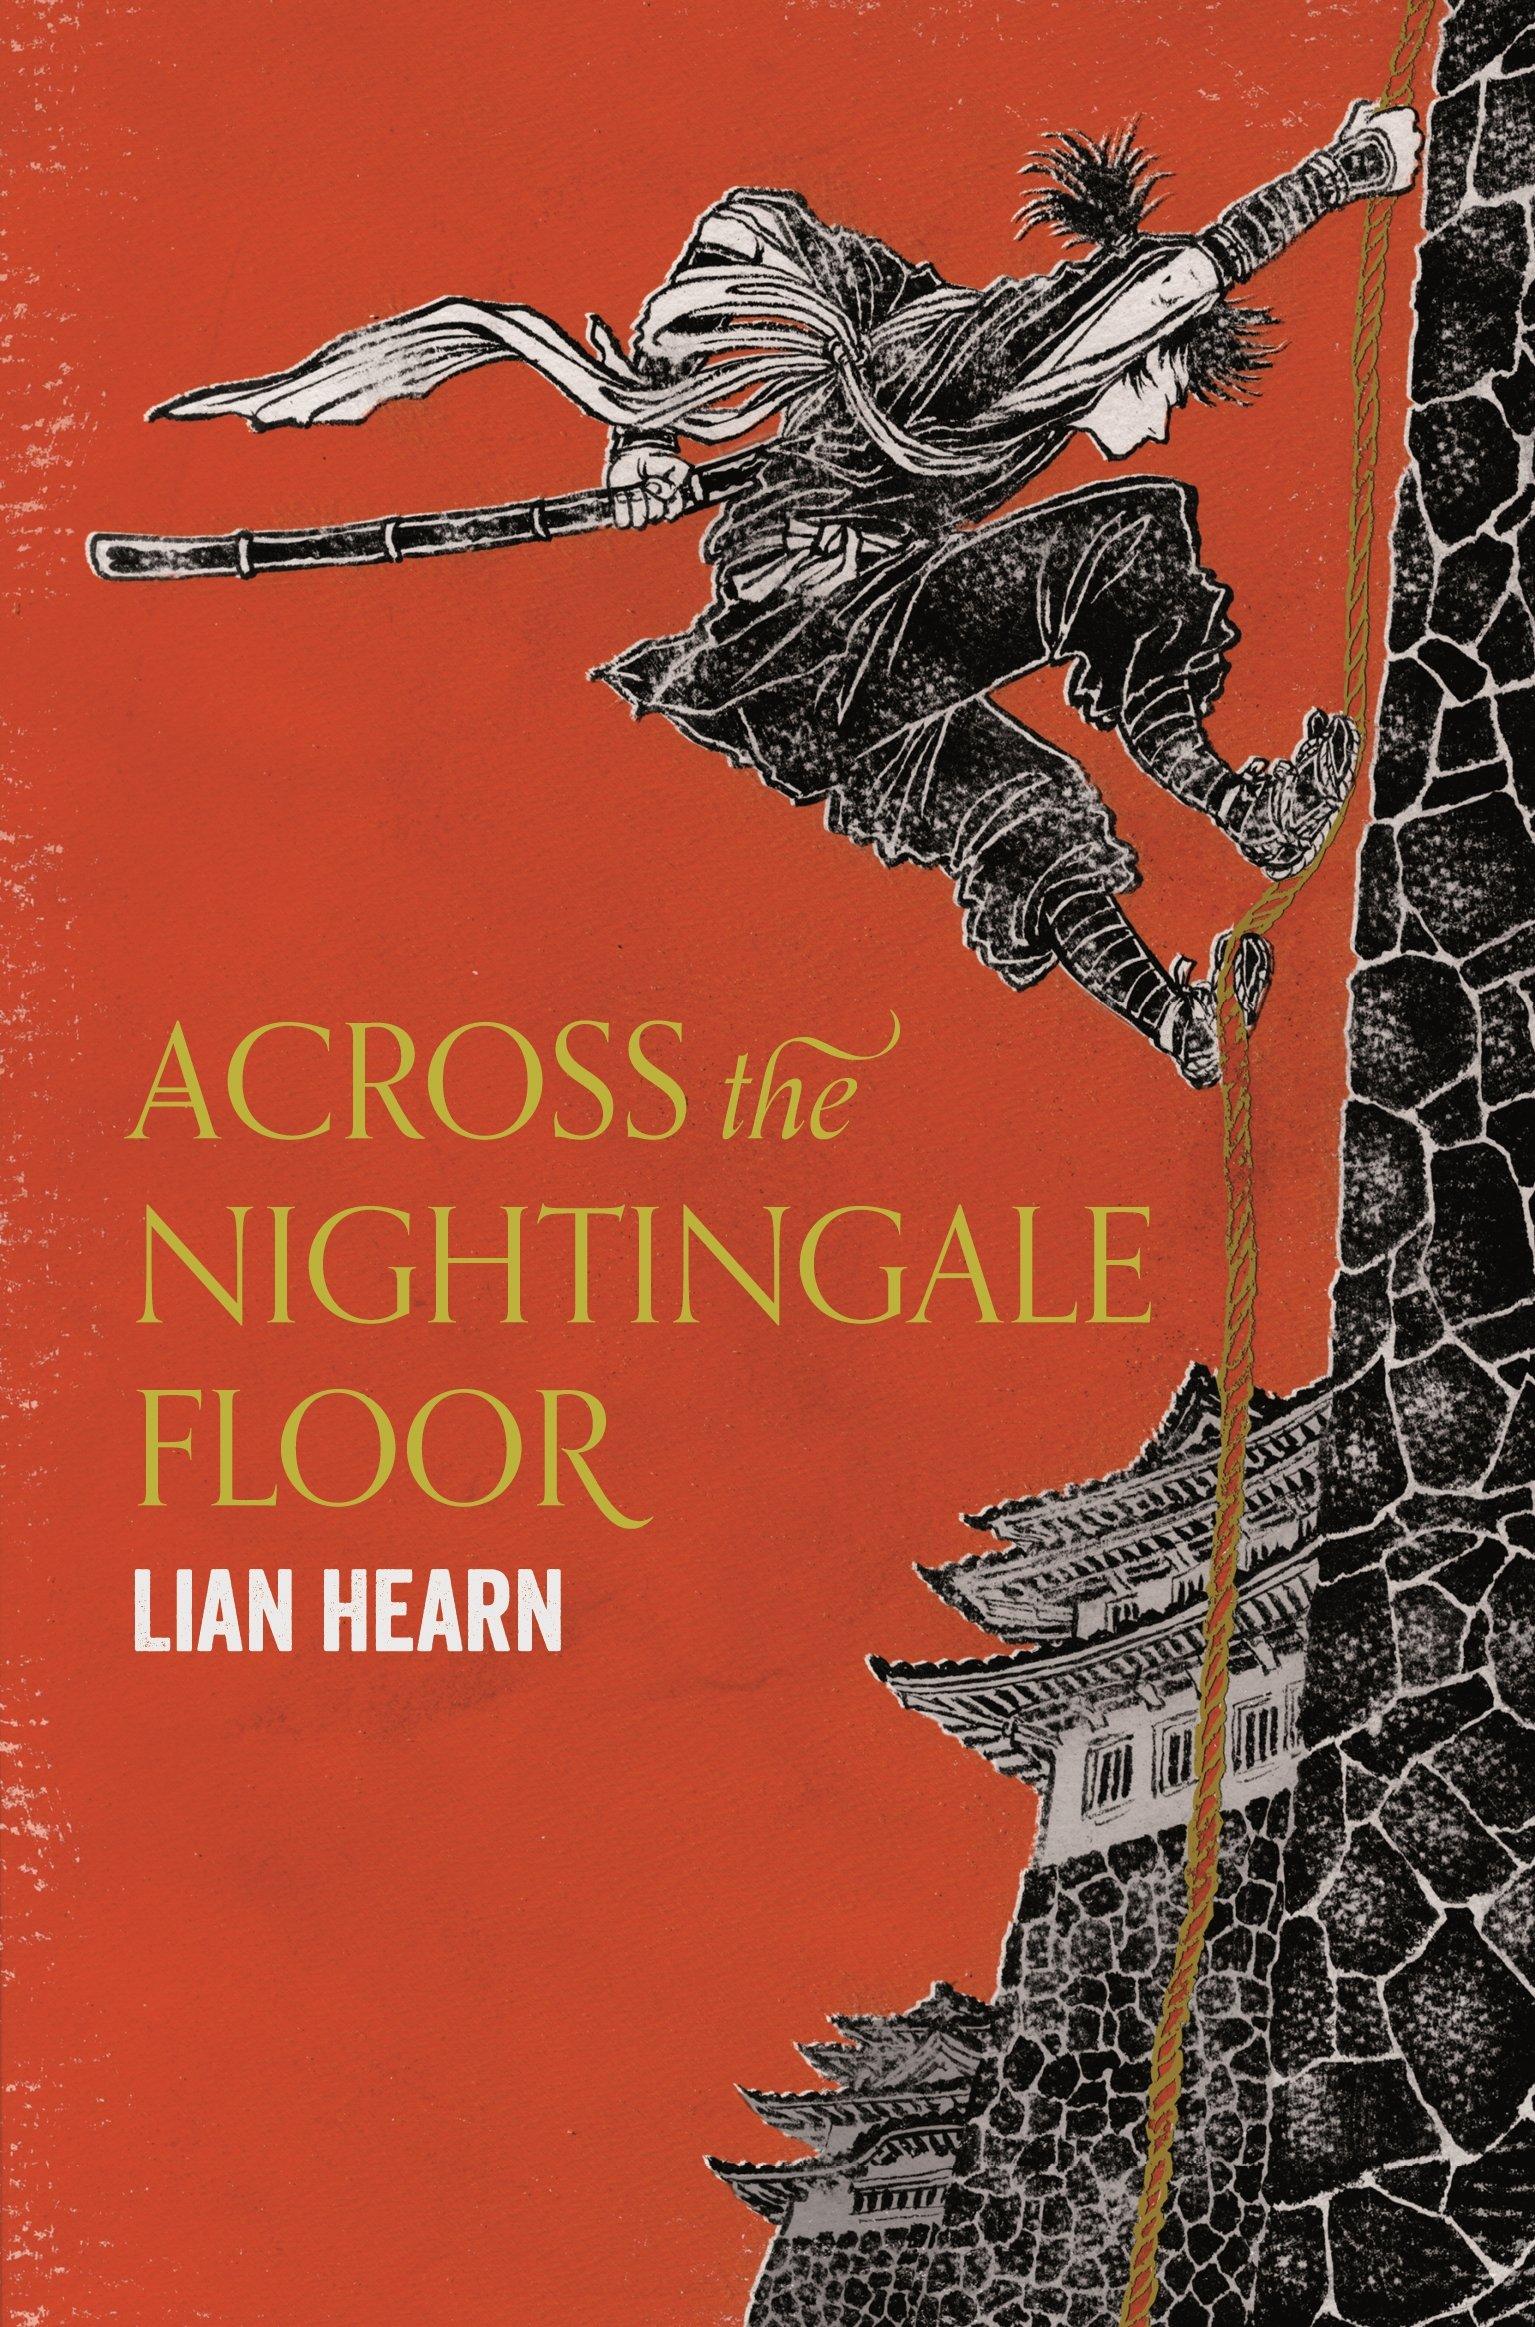 Across the Nightingale Floor (Tales of the Otori, Band 1)